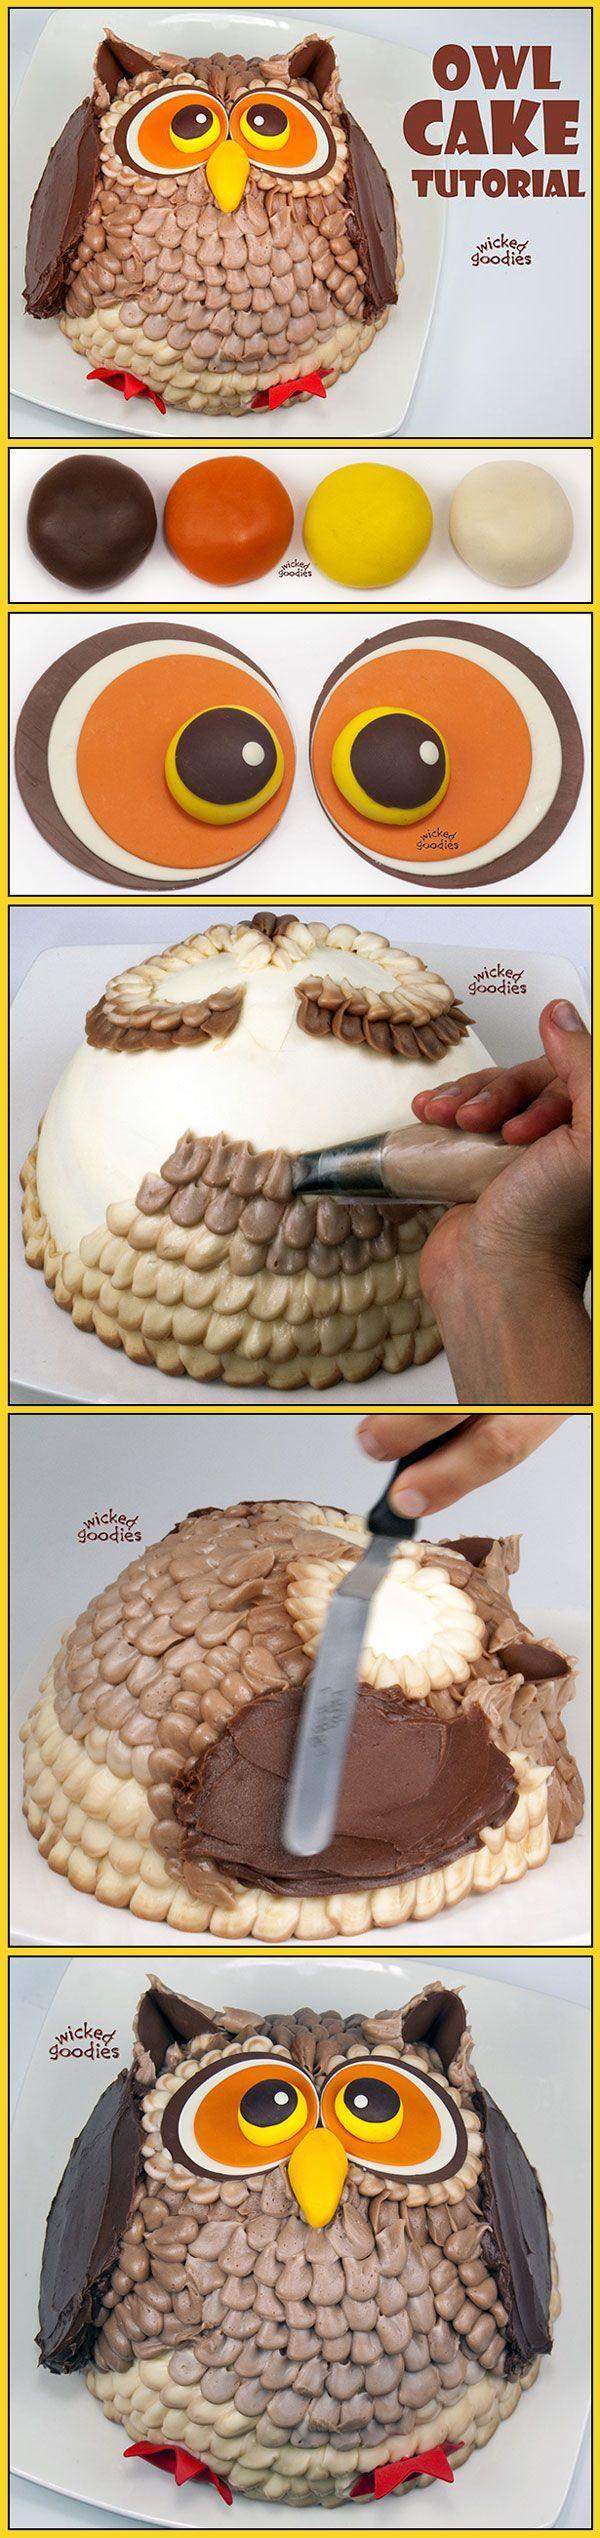 How to Make an Owl Cake Owl cakes Cake tutorial and Goodies